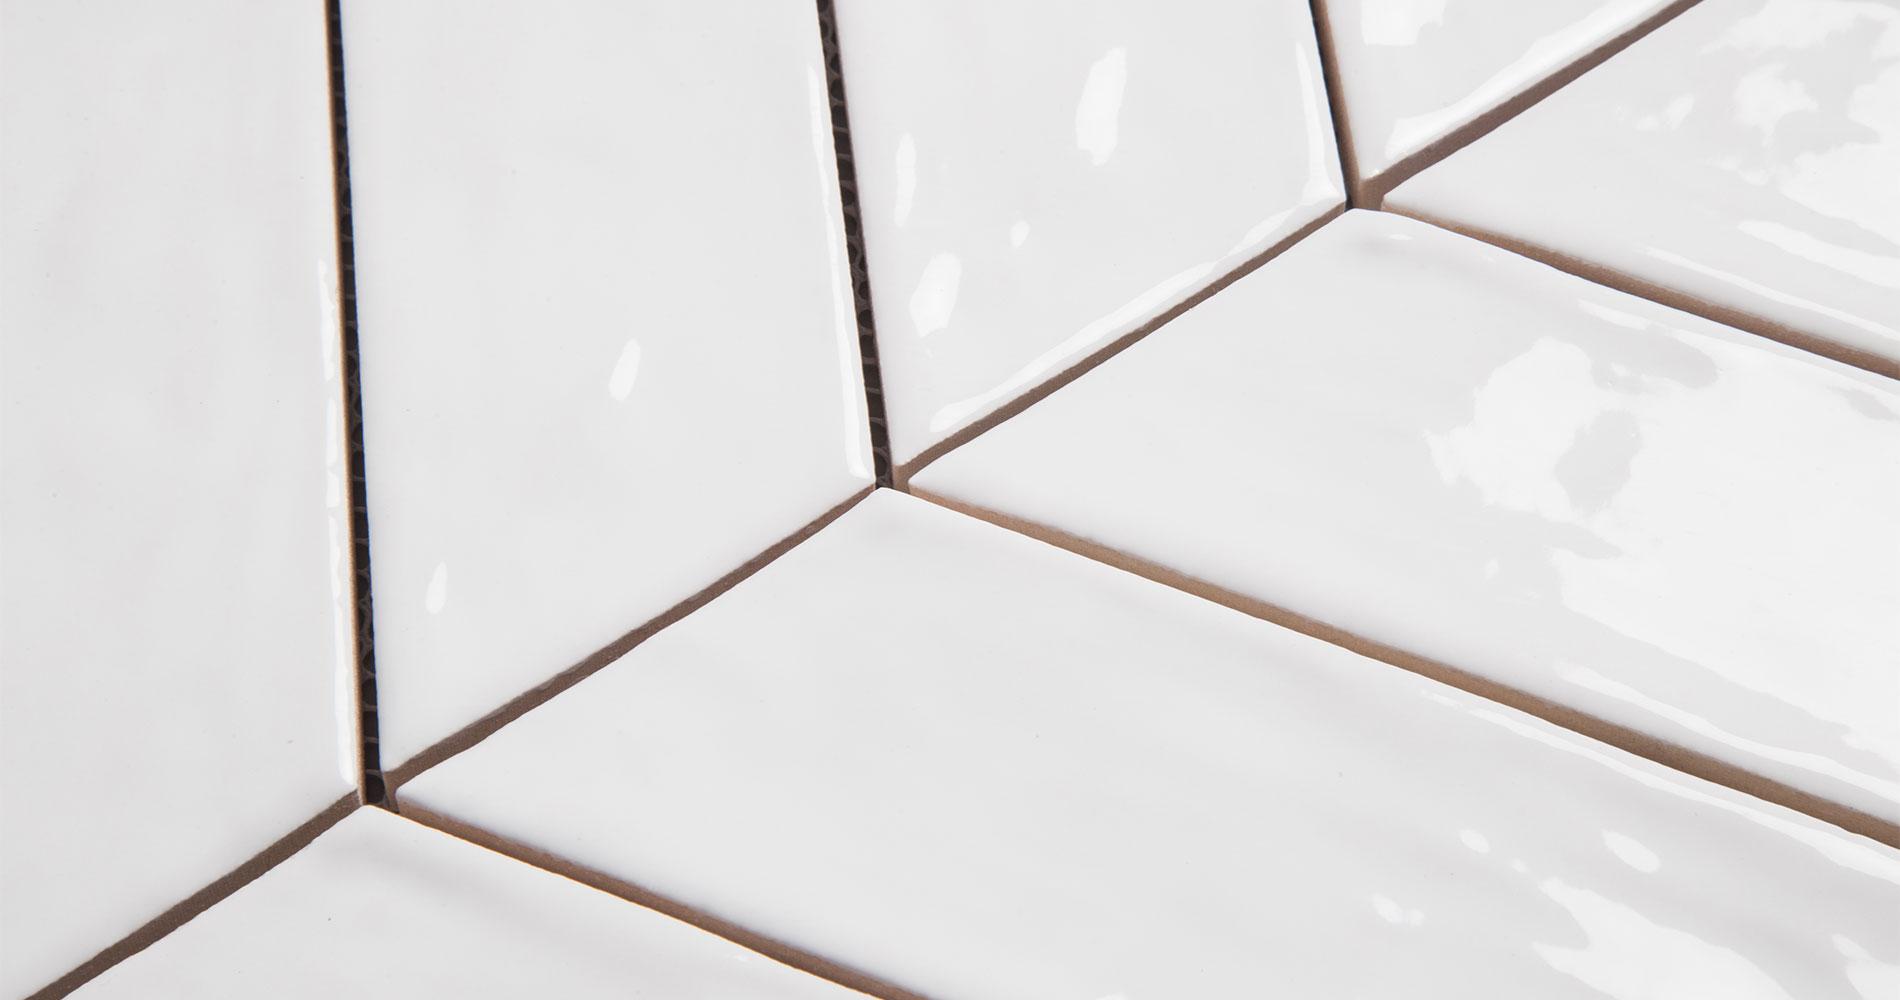 Century-Mosaic-Ceramic-Chevron-Mosaic-Tile-Collection-2